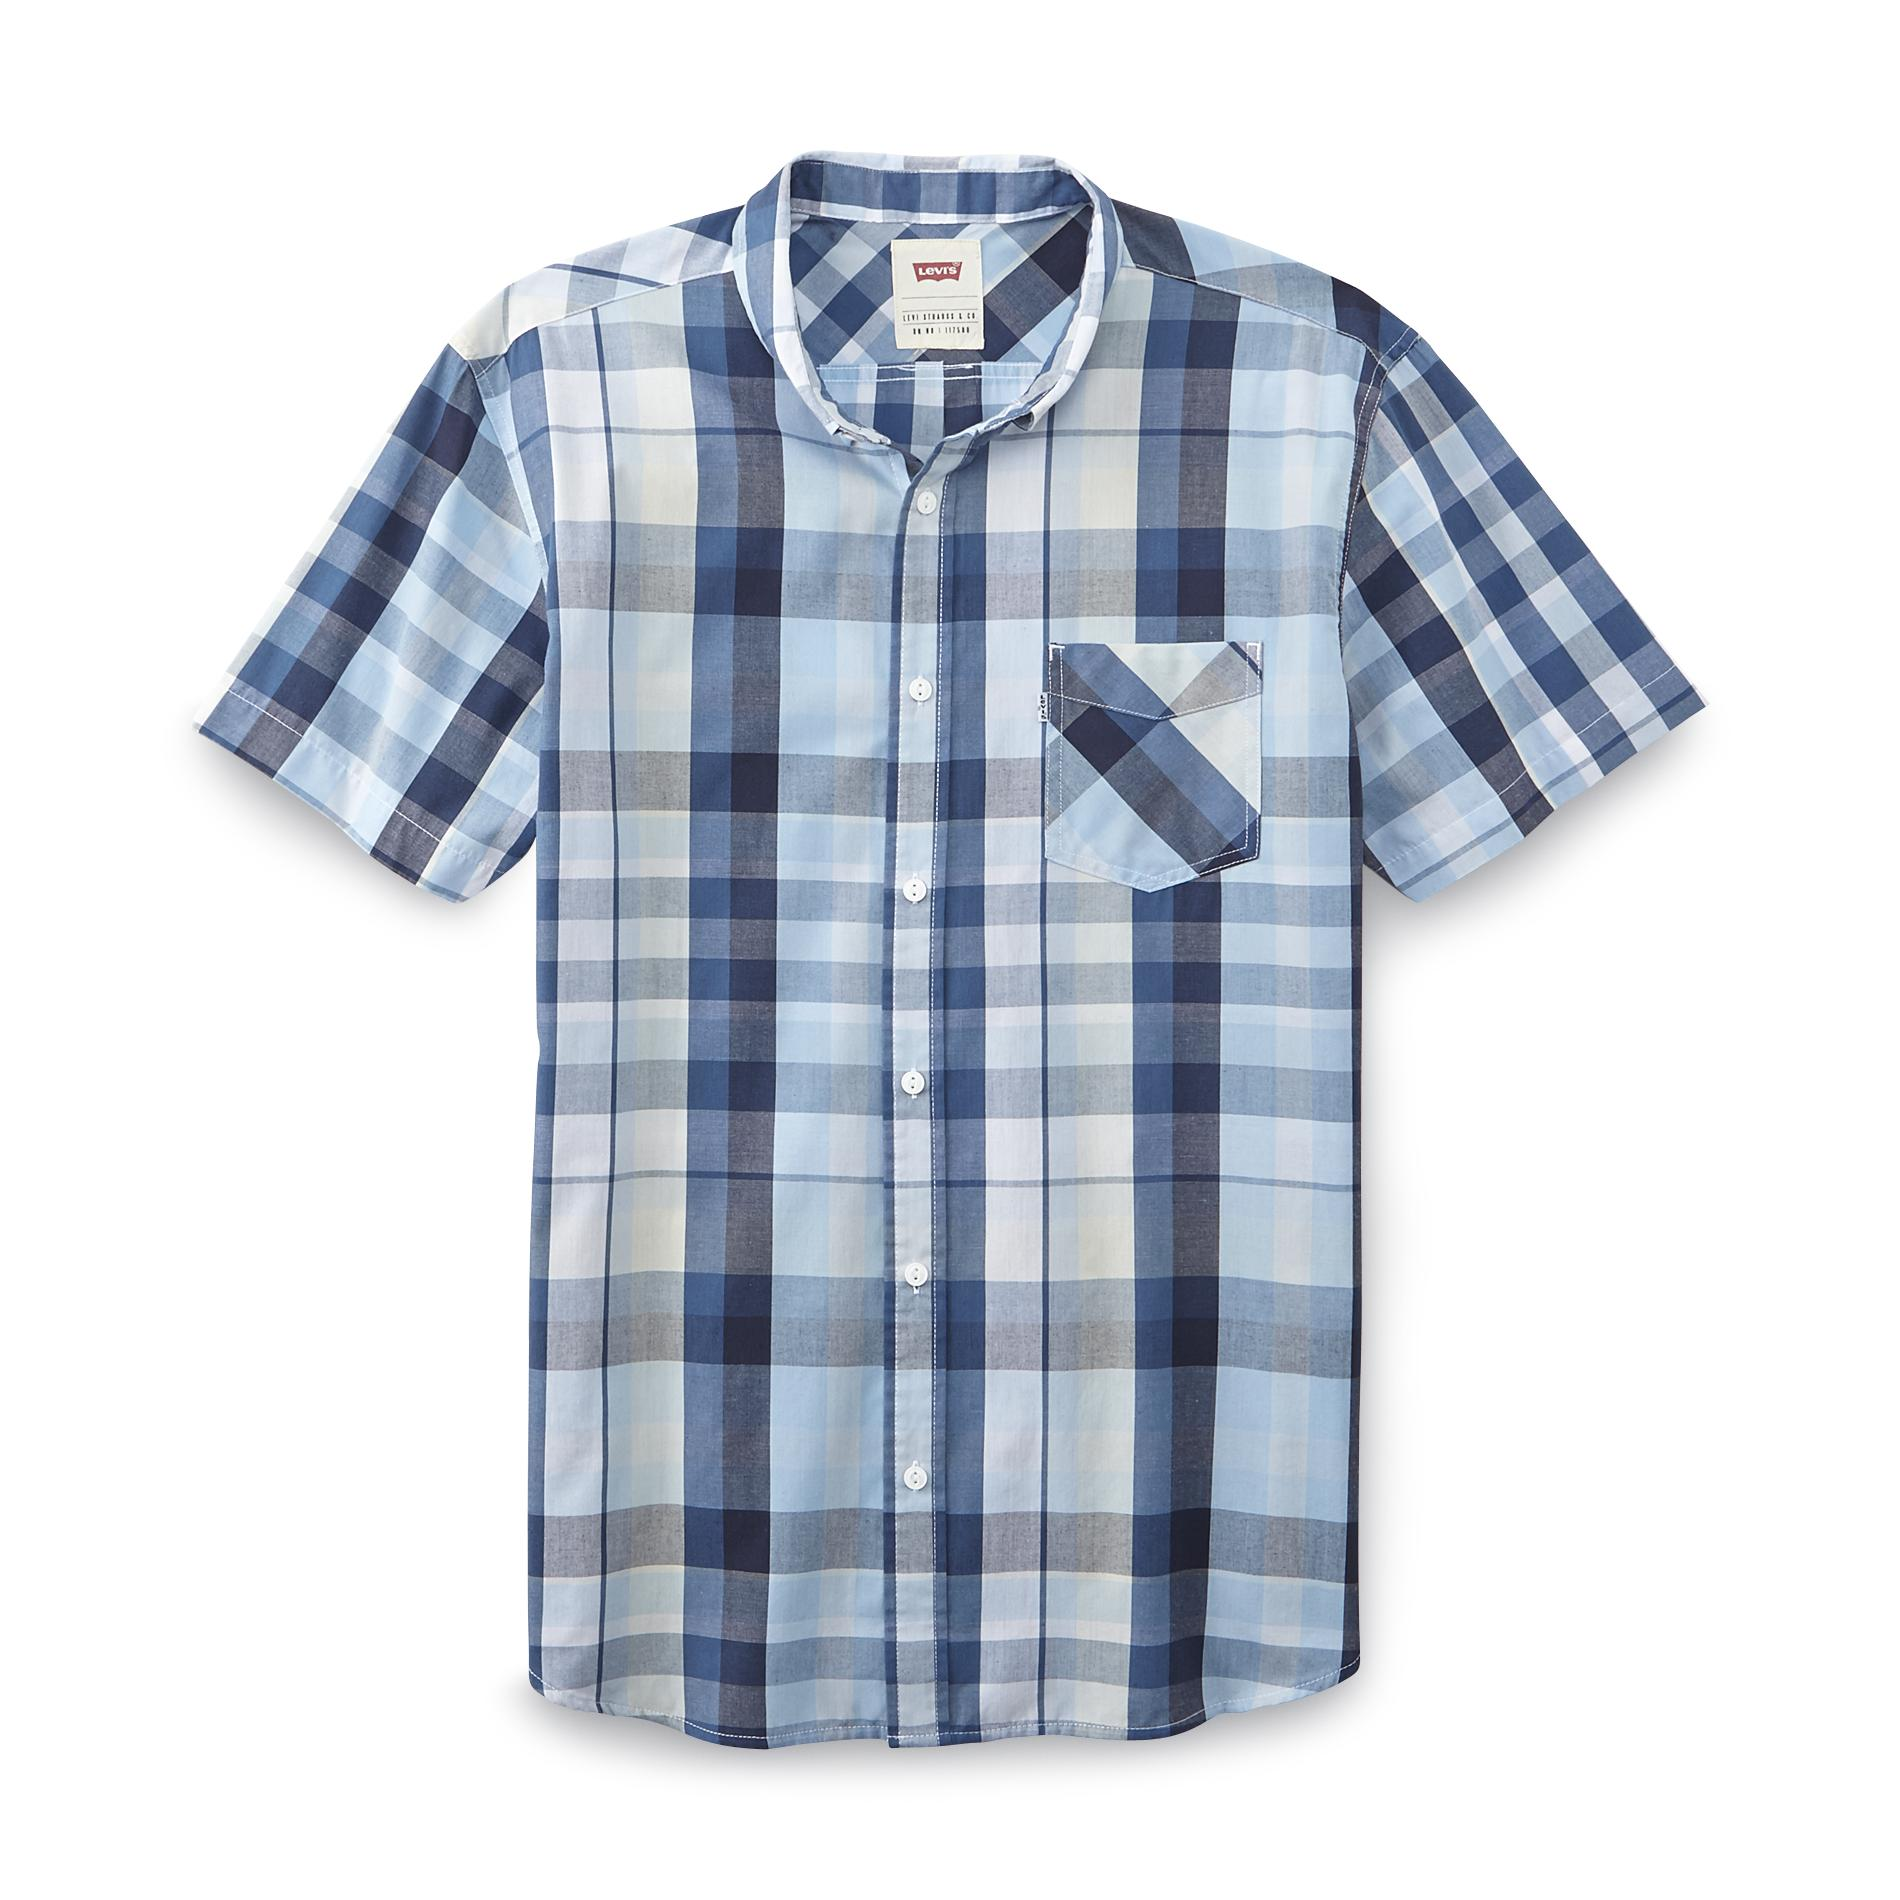 Levi's Men's Short-Sleeve Shirt - Plaid PartNumber: 041VA82877012P MfgPartNumber: 3LYSW6332